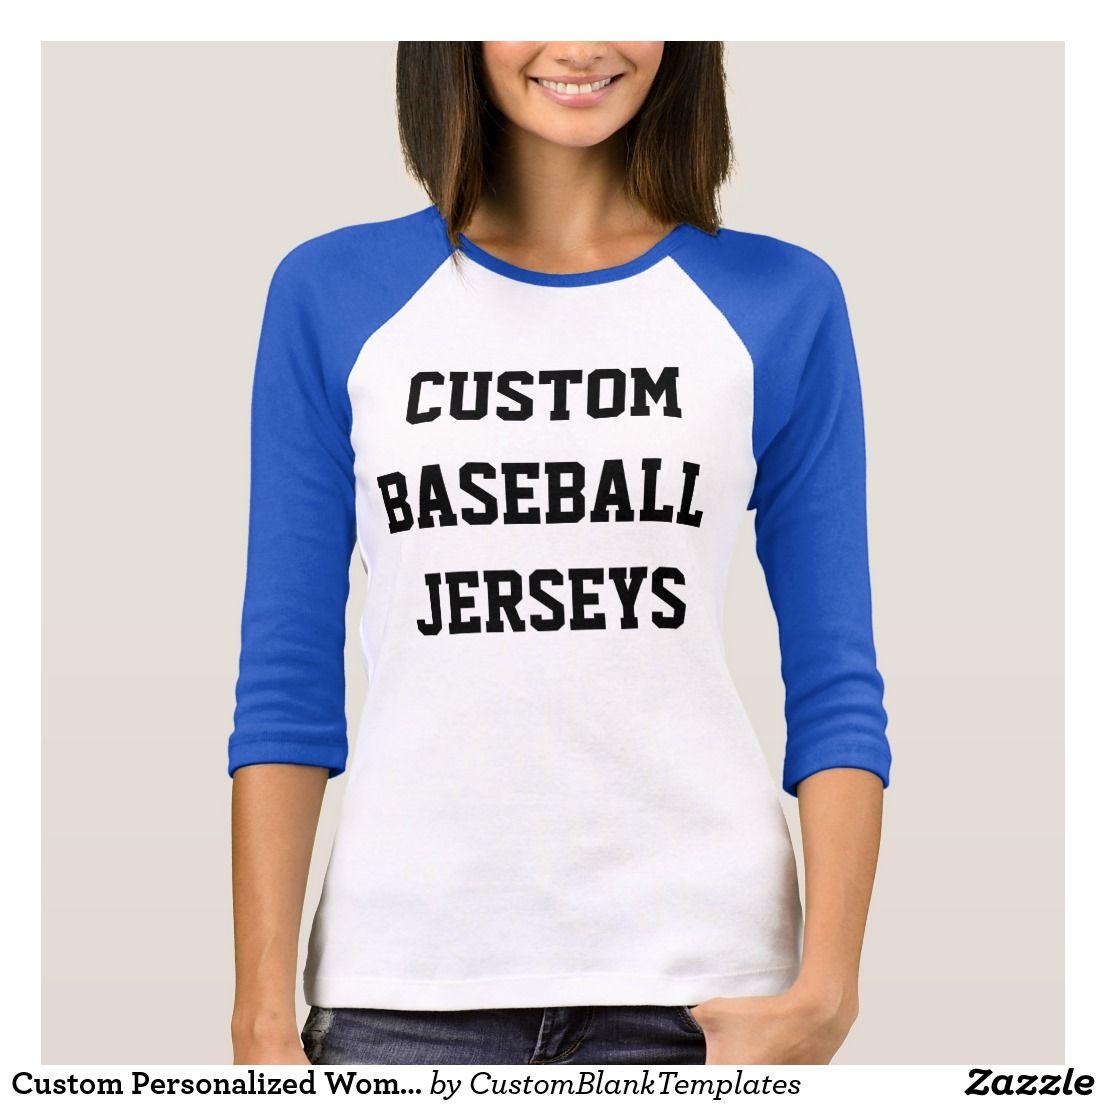 Design your own t shirt zazzle - Custom Personalized Womens Raglan Baseball Jersey